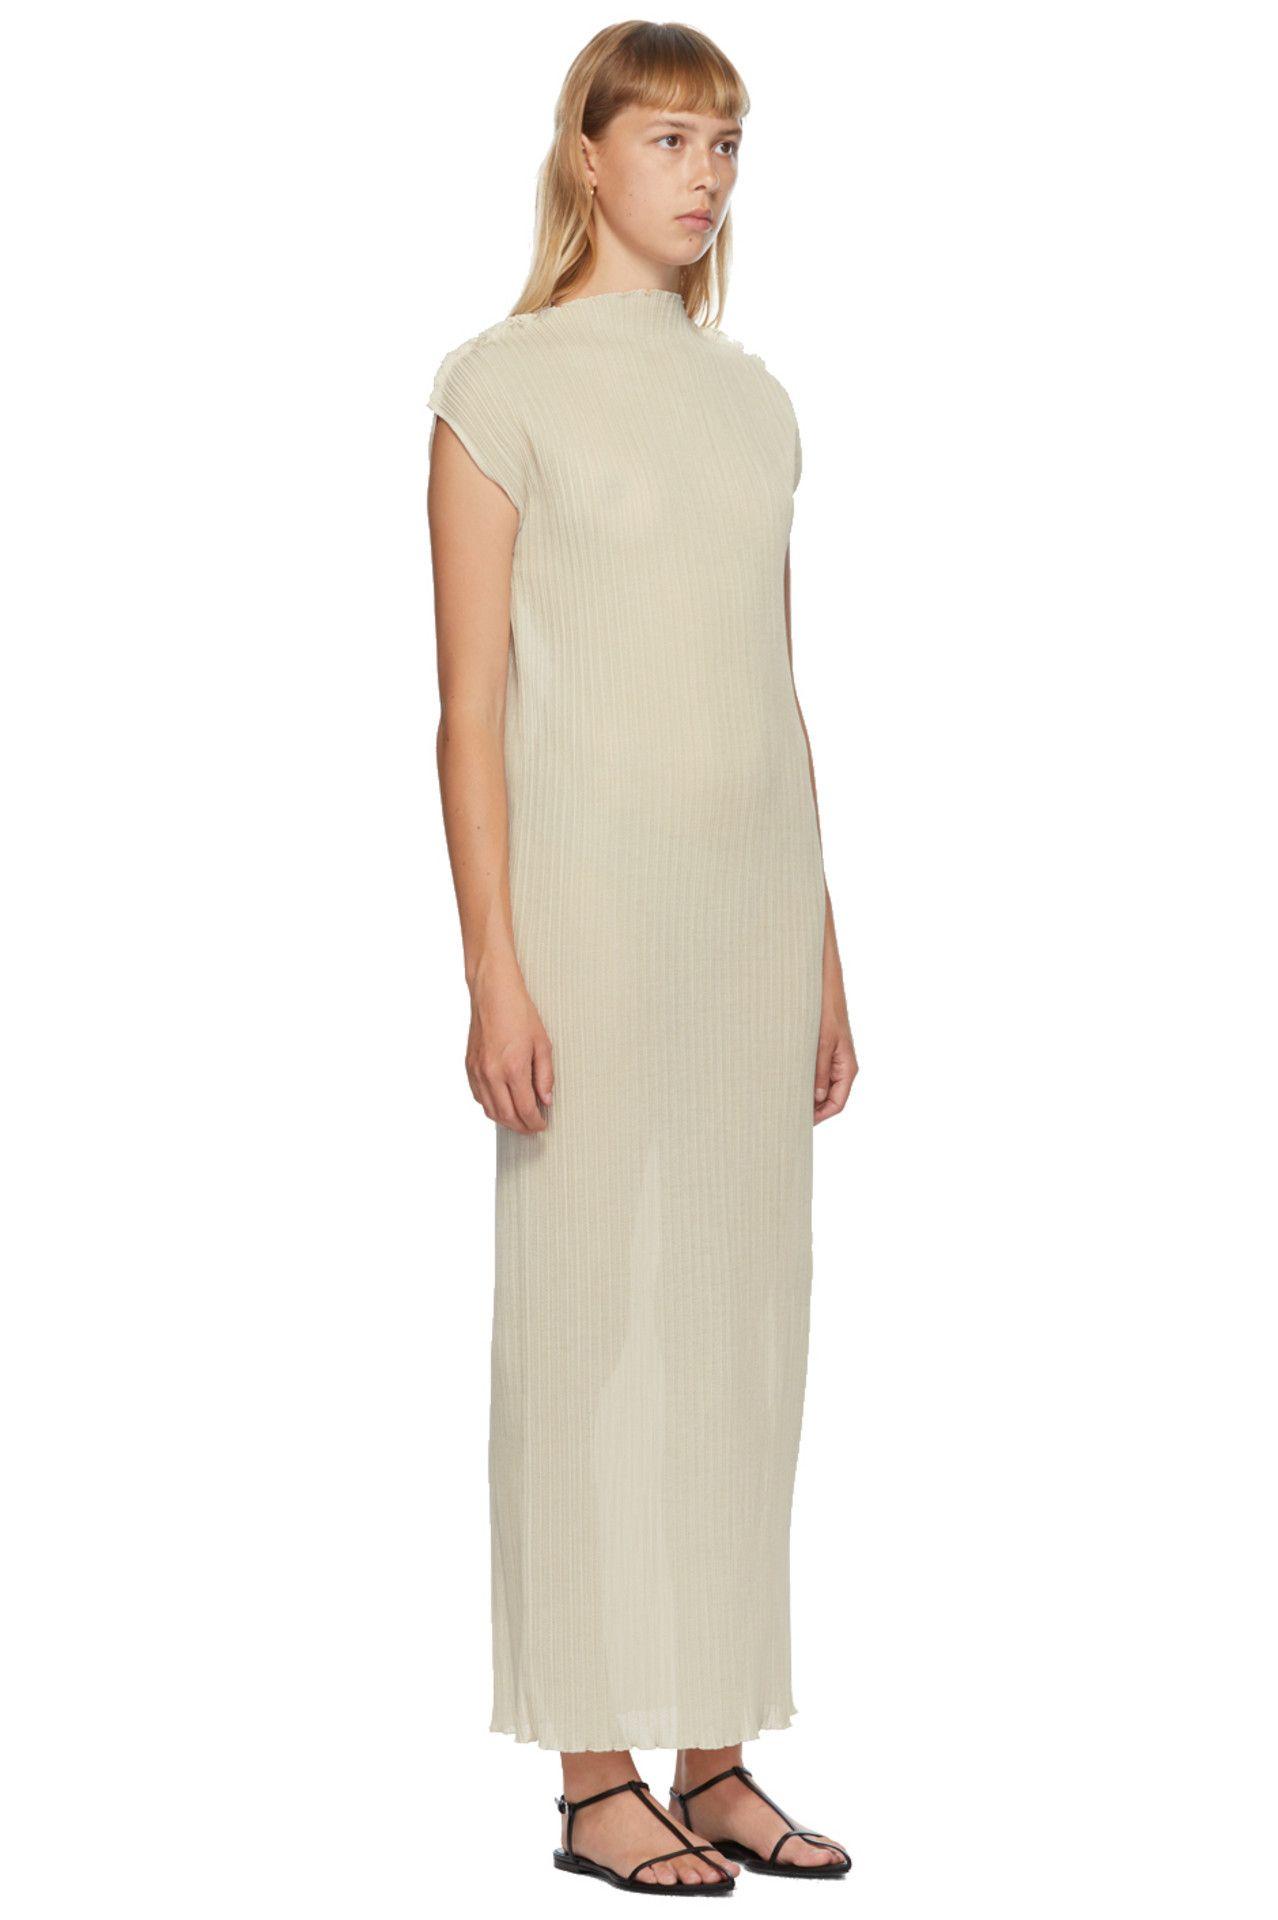 Jil Sander Off White Pleated Turtleneck Dress Turtle Neck Dress Dresses Jil Sander Dress [ 1920 x 1278 Pixel ]